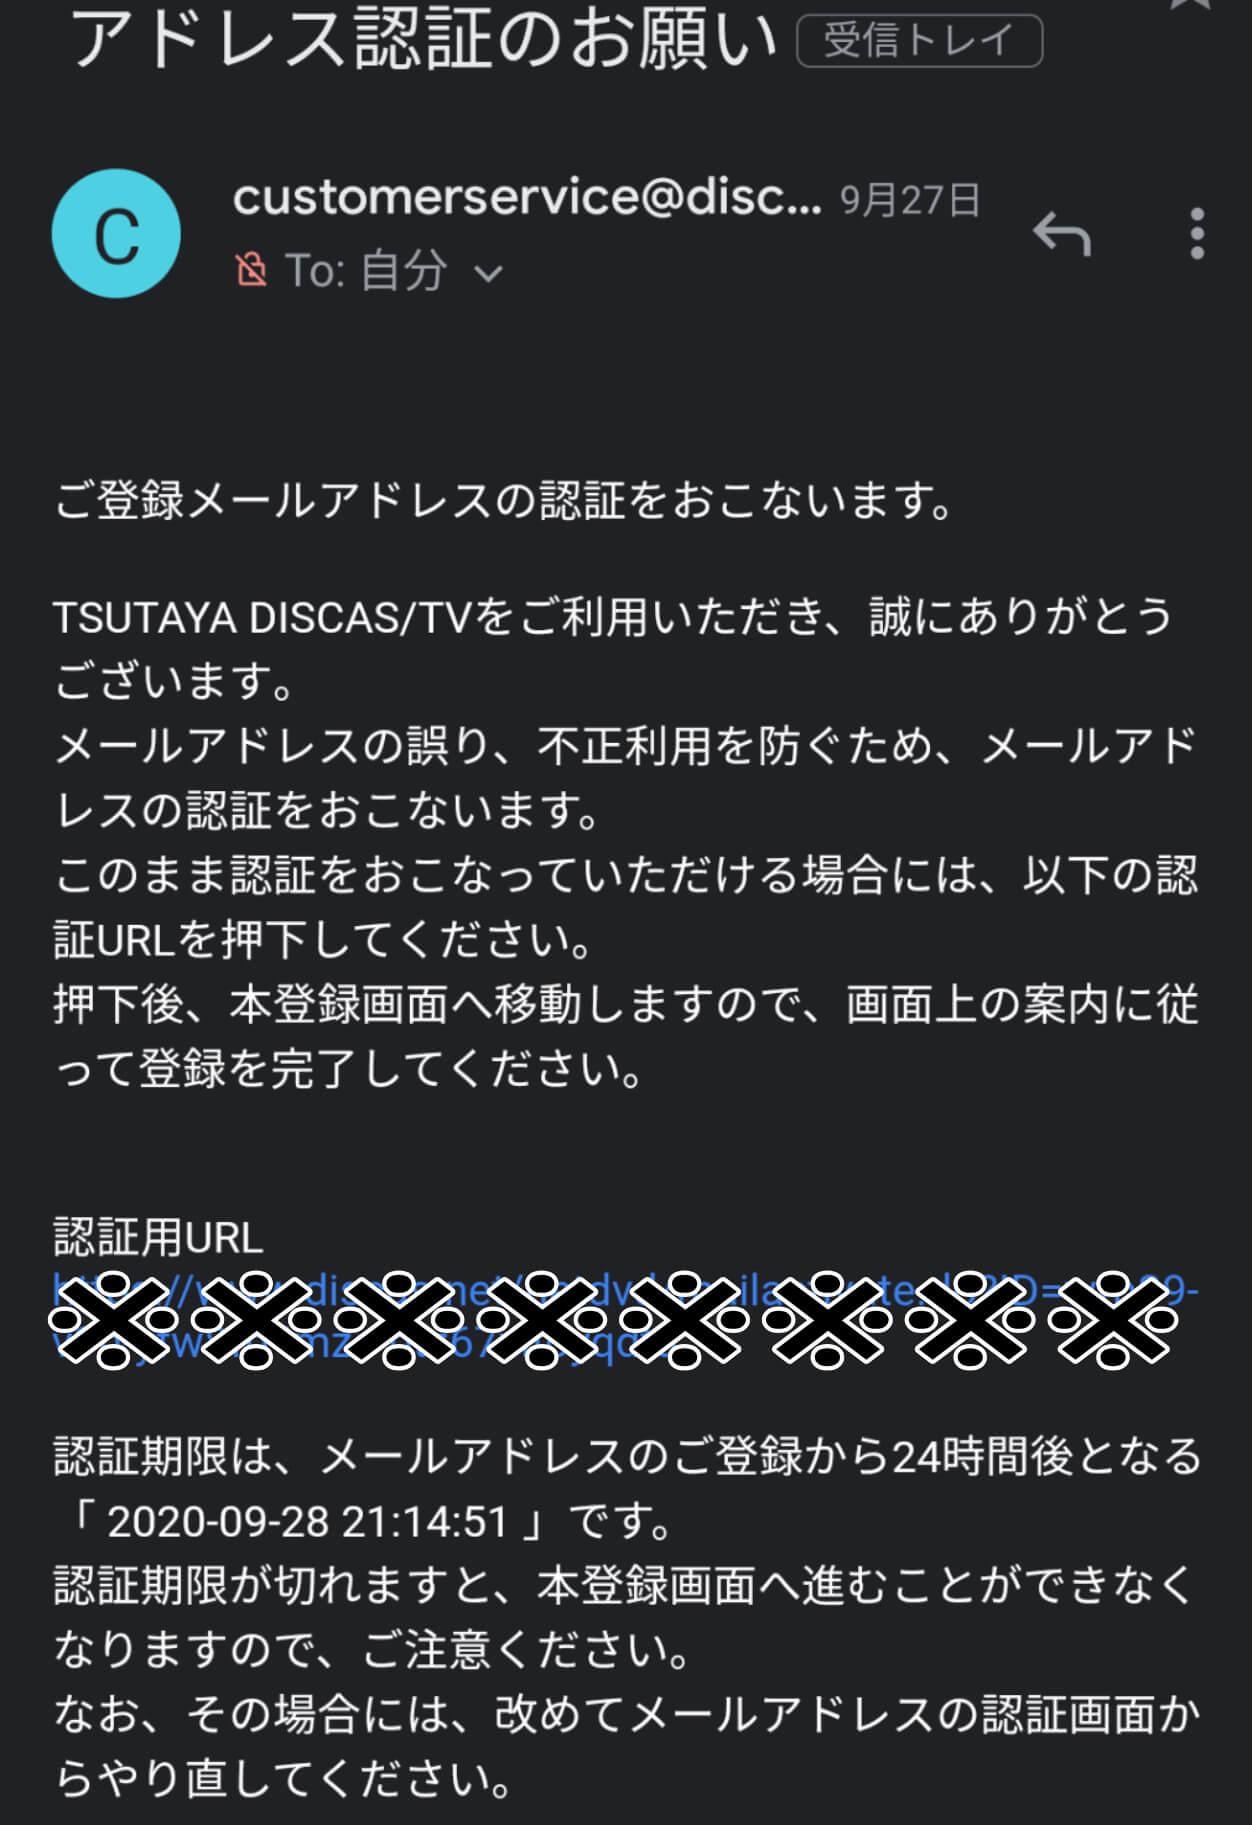 TSUTAYA DISCAS登録詳細画像